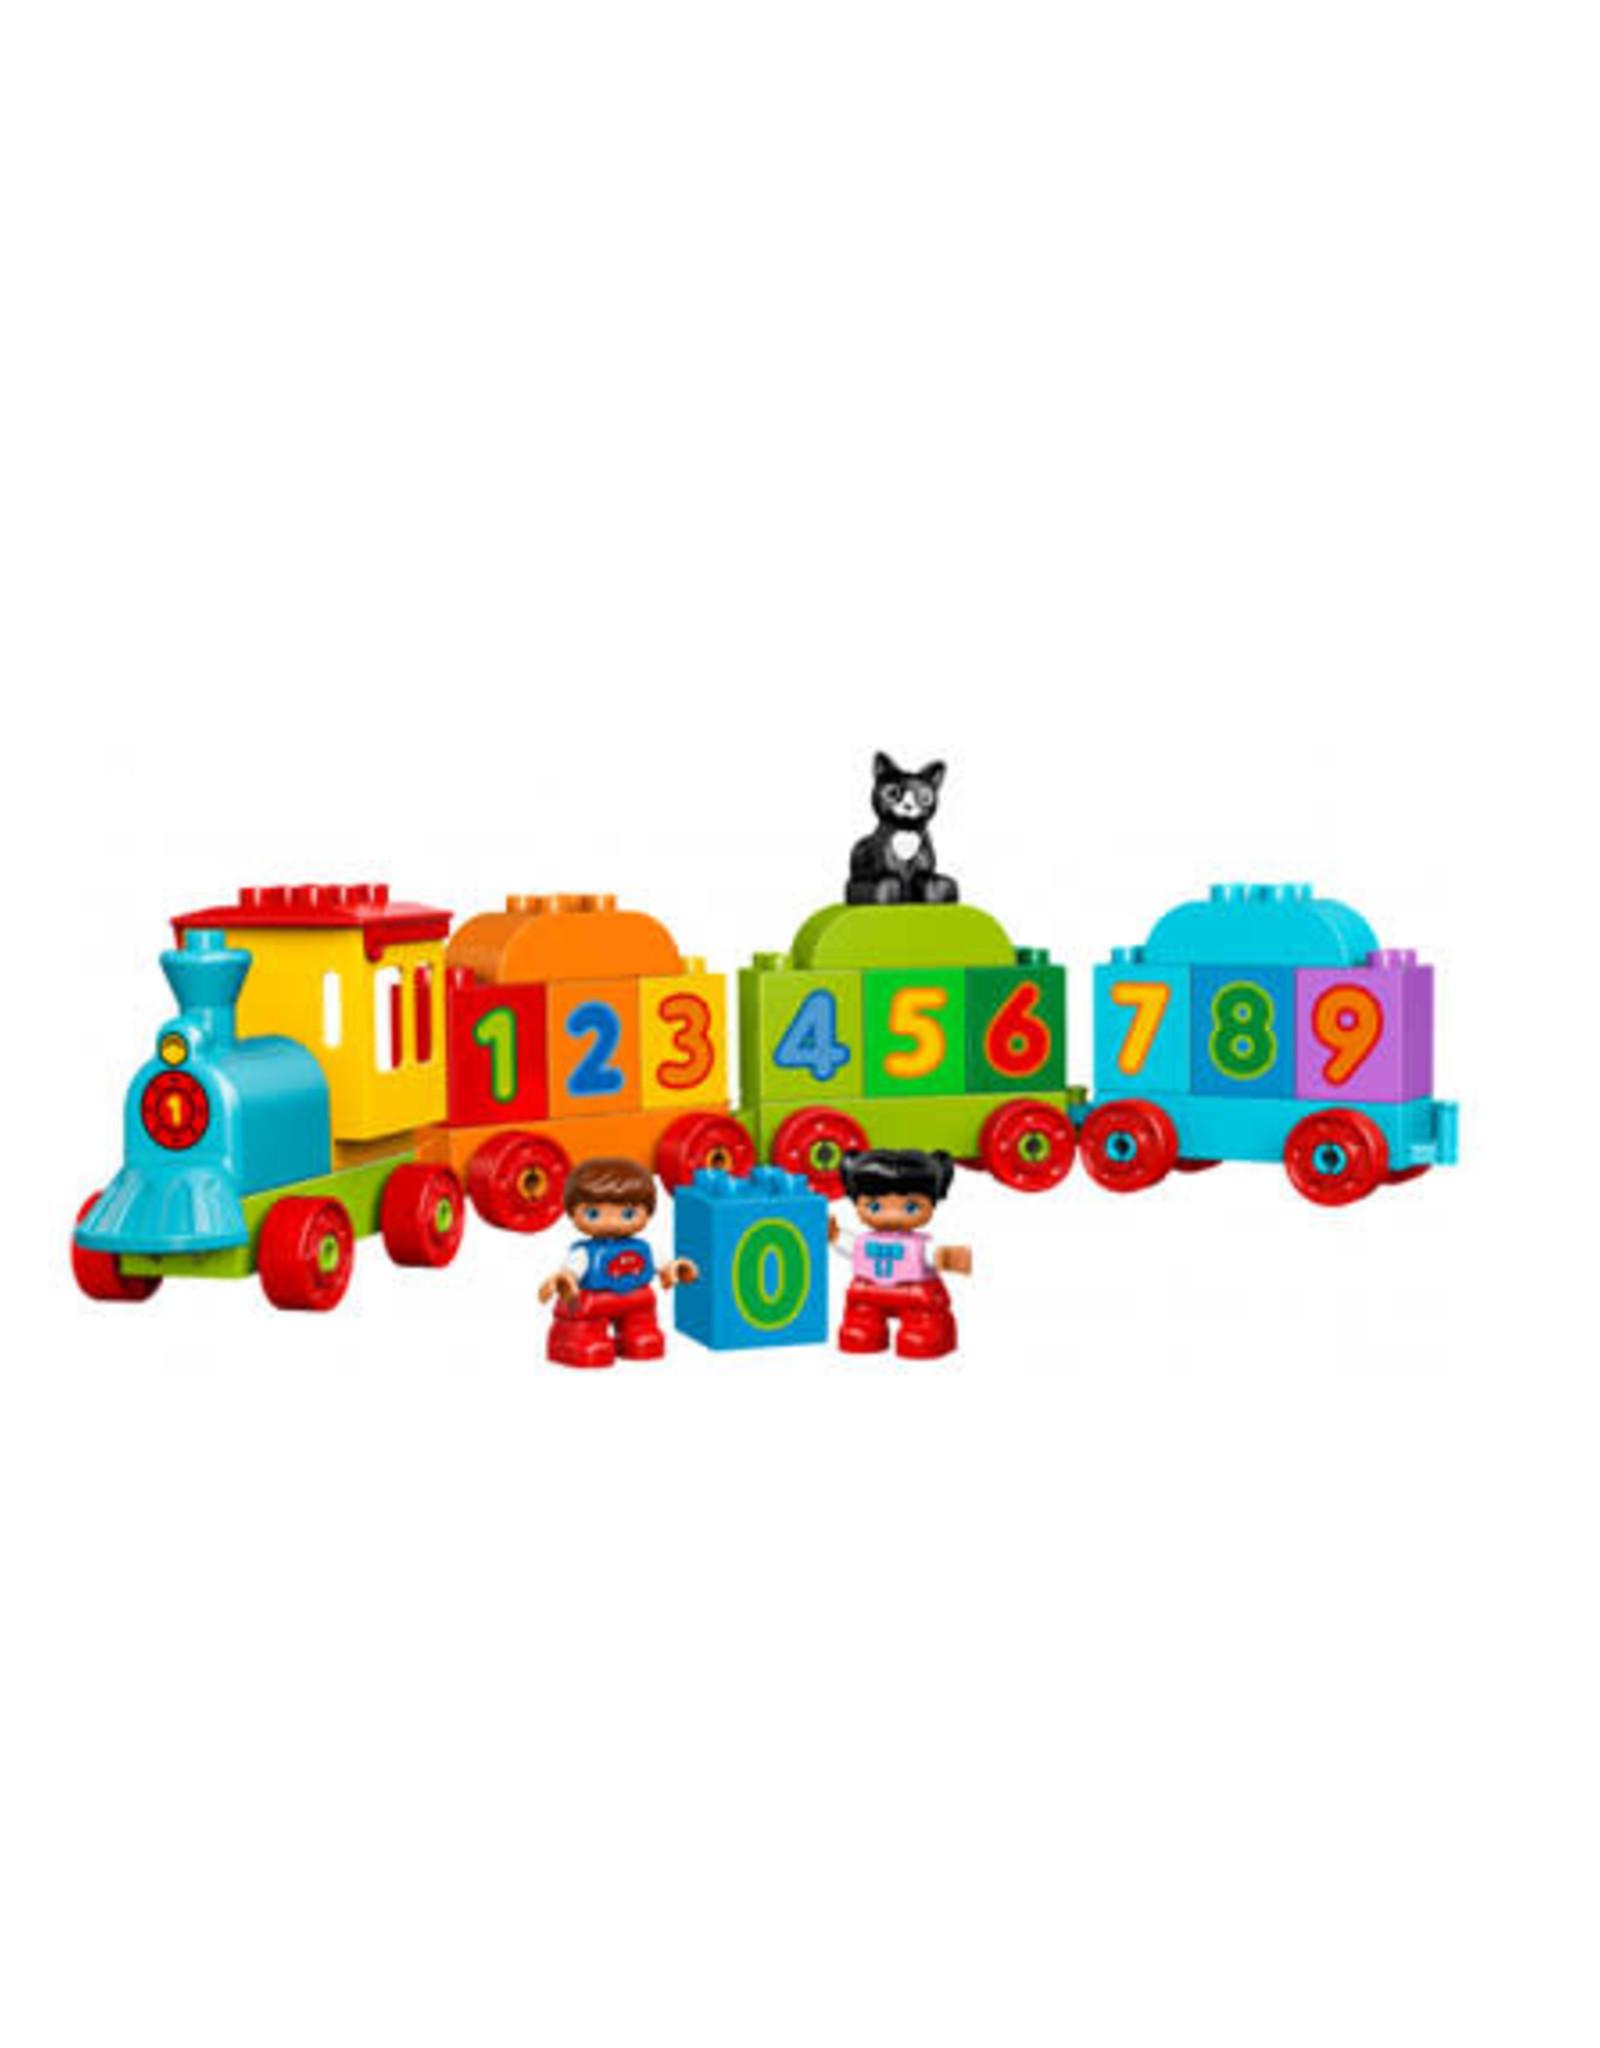 LEGO LEGO 10847 Getallentrein DUPLO NIEUW